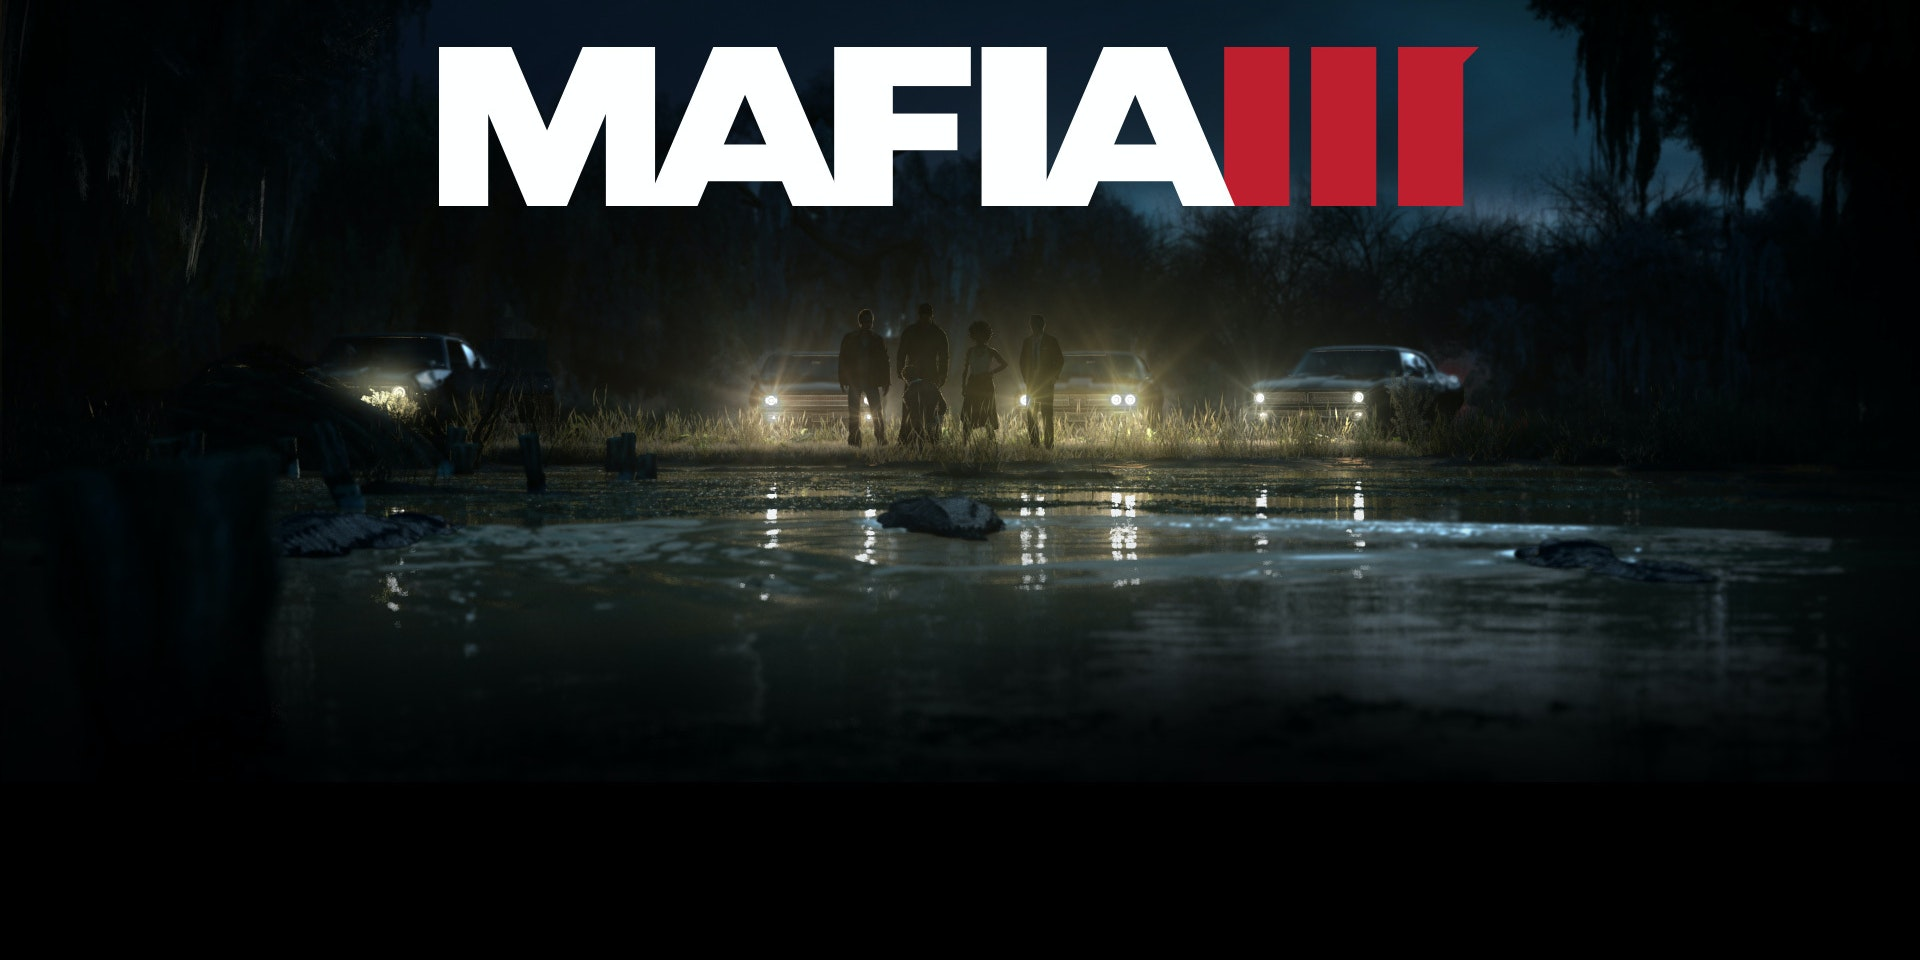 New 'Mafia III' Story Trailer Reveals October 7 Release Date